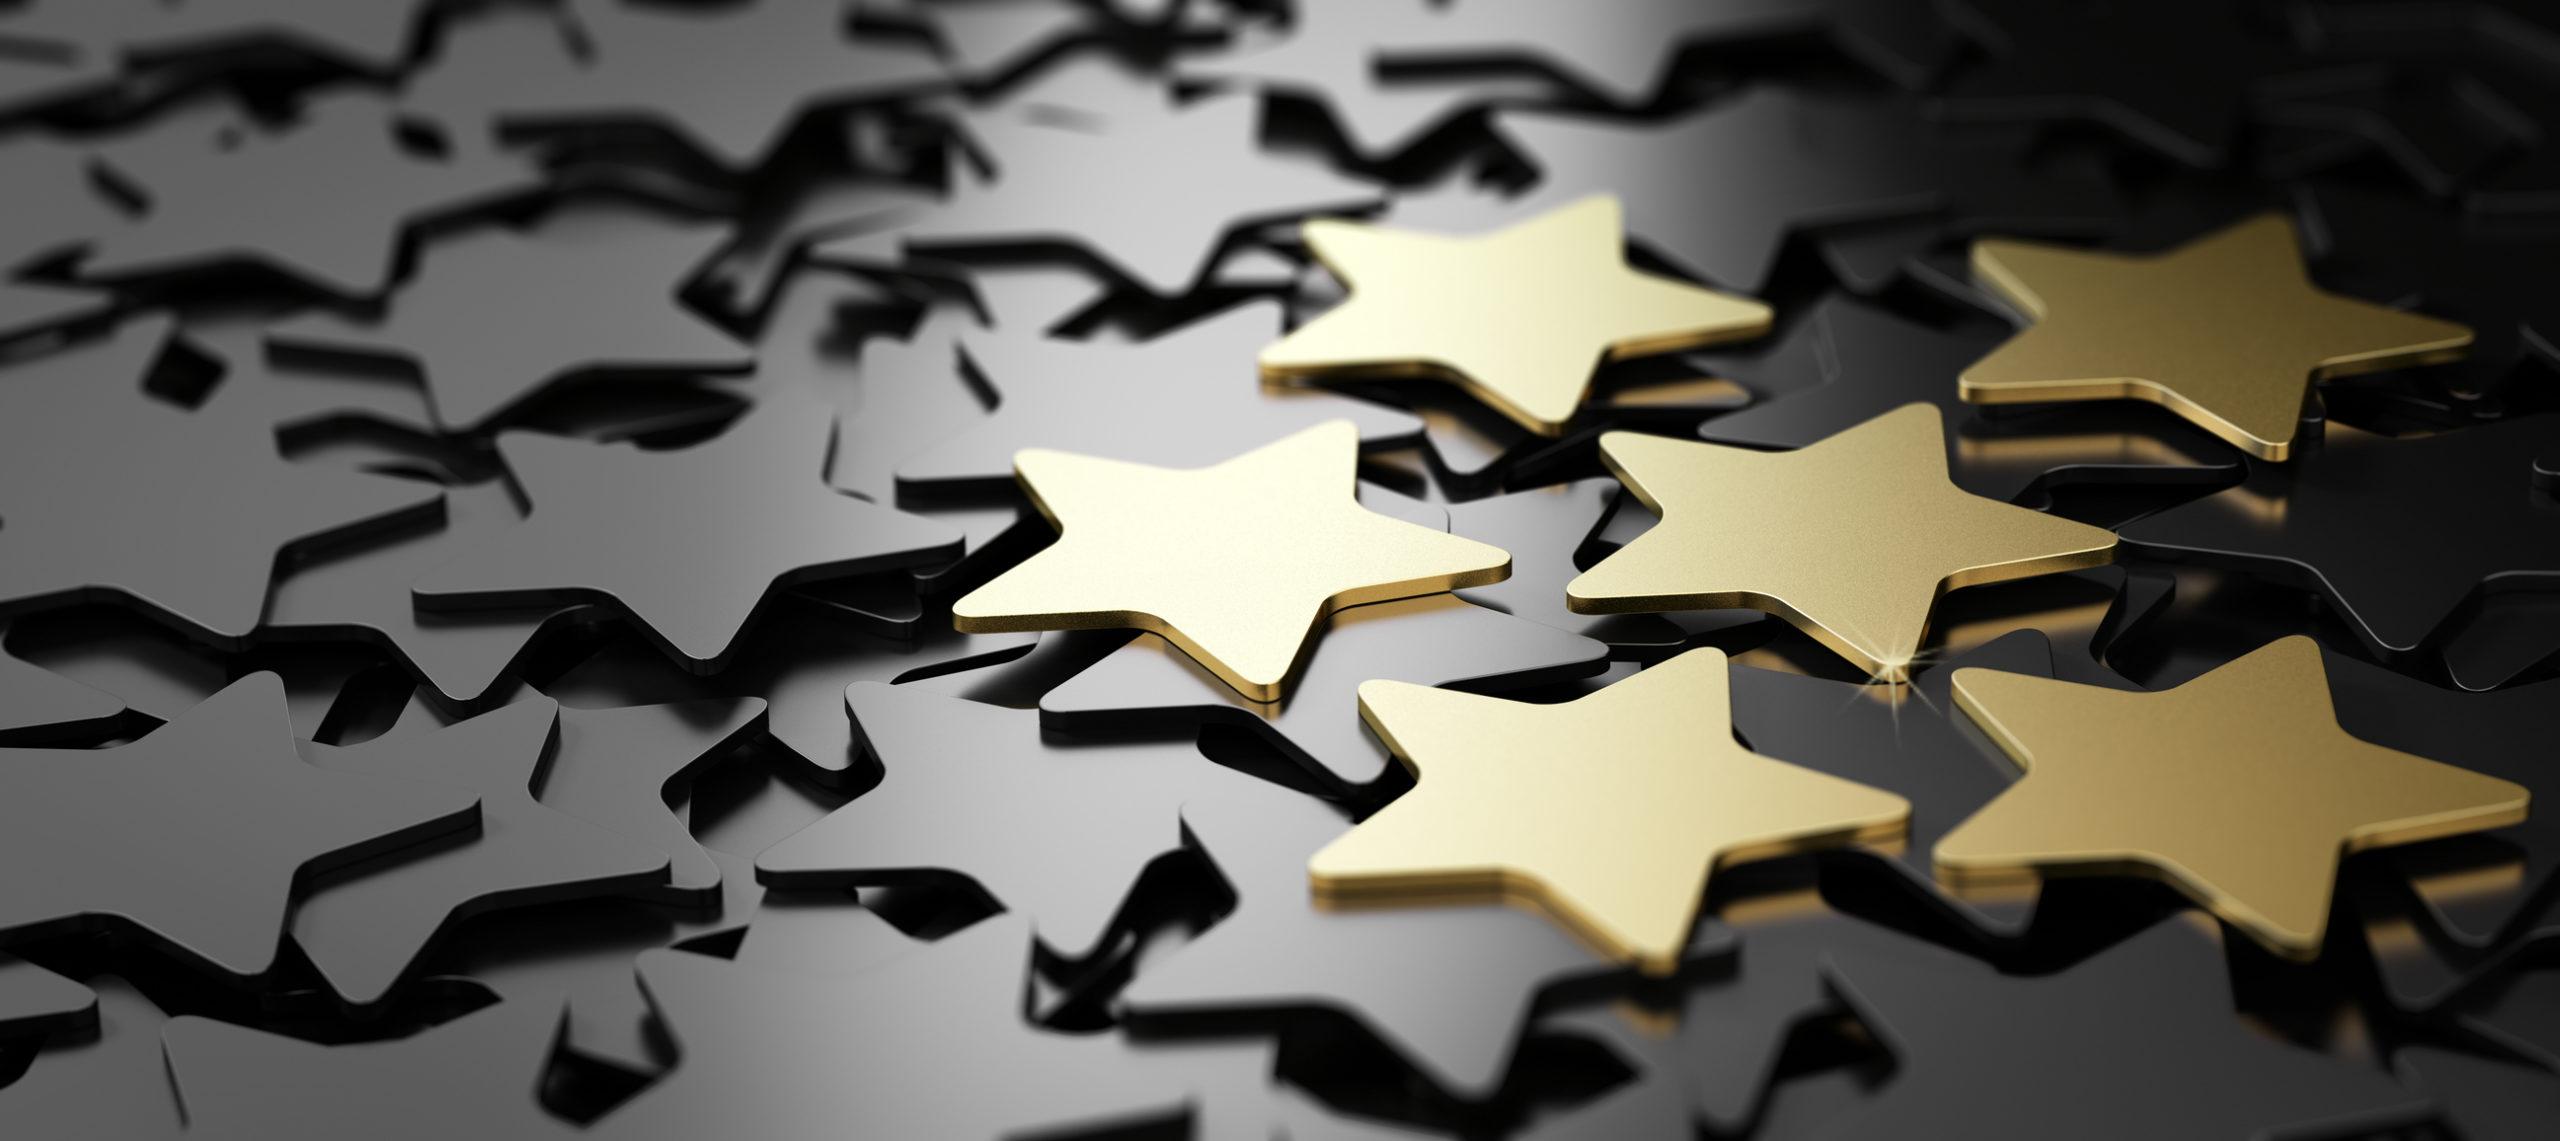 Six golden stars over black background. 3D illustration of high quality customer service